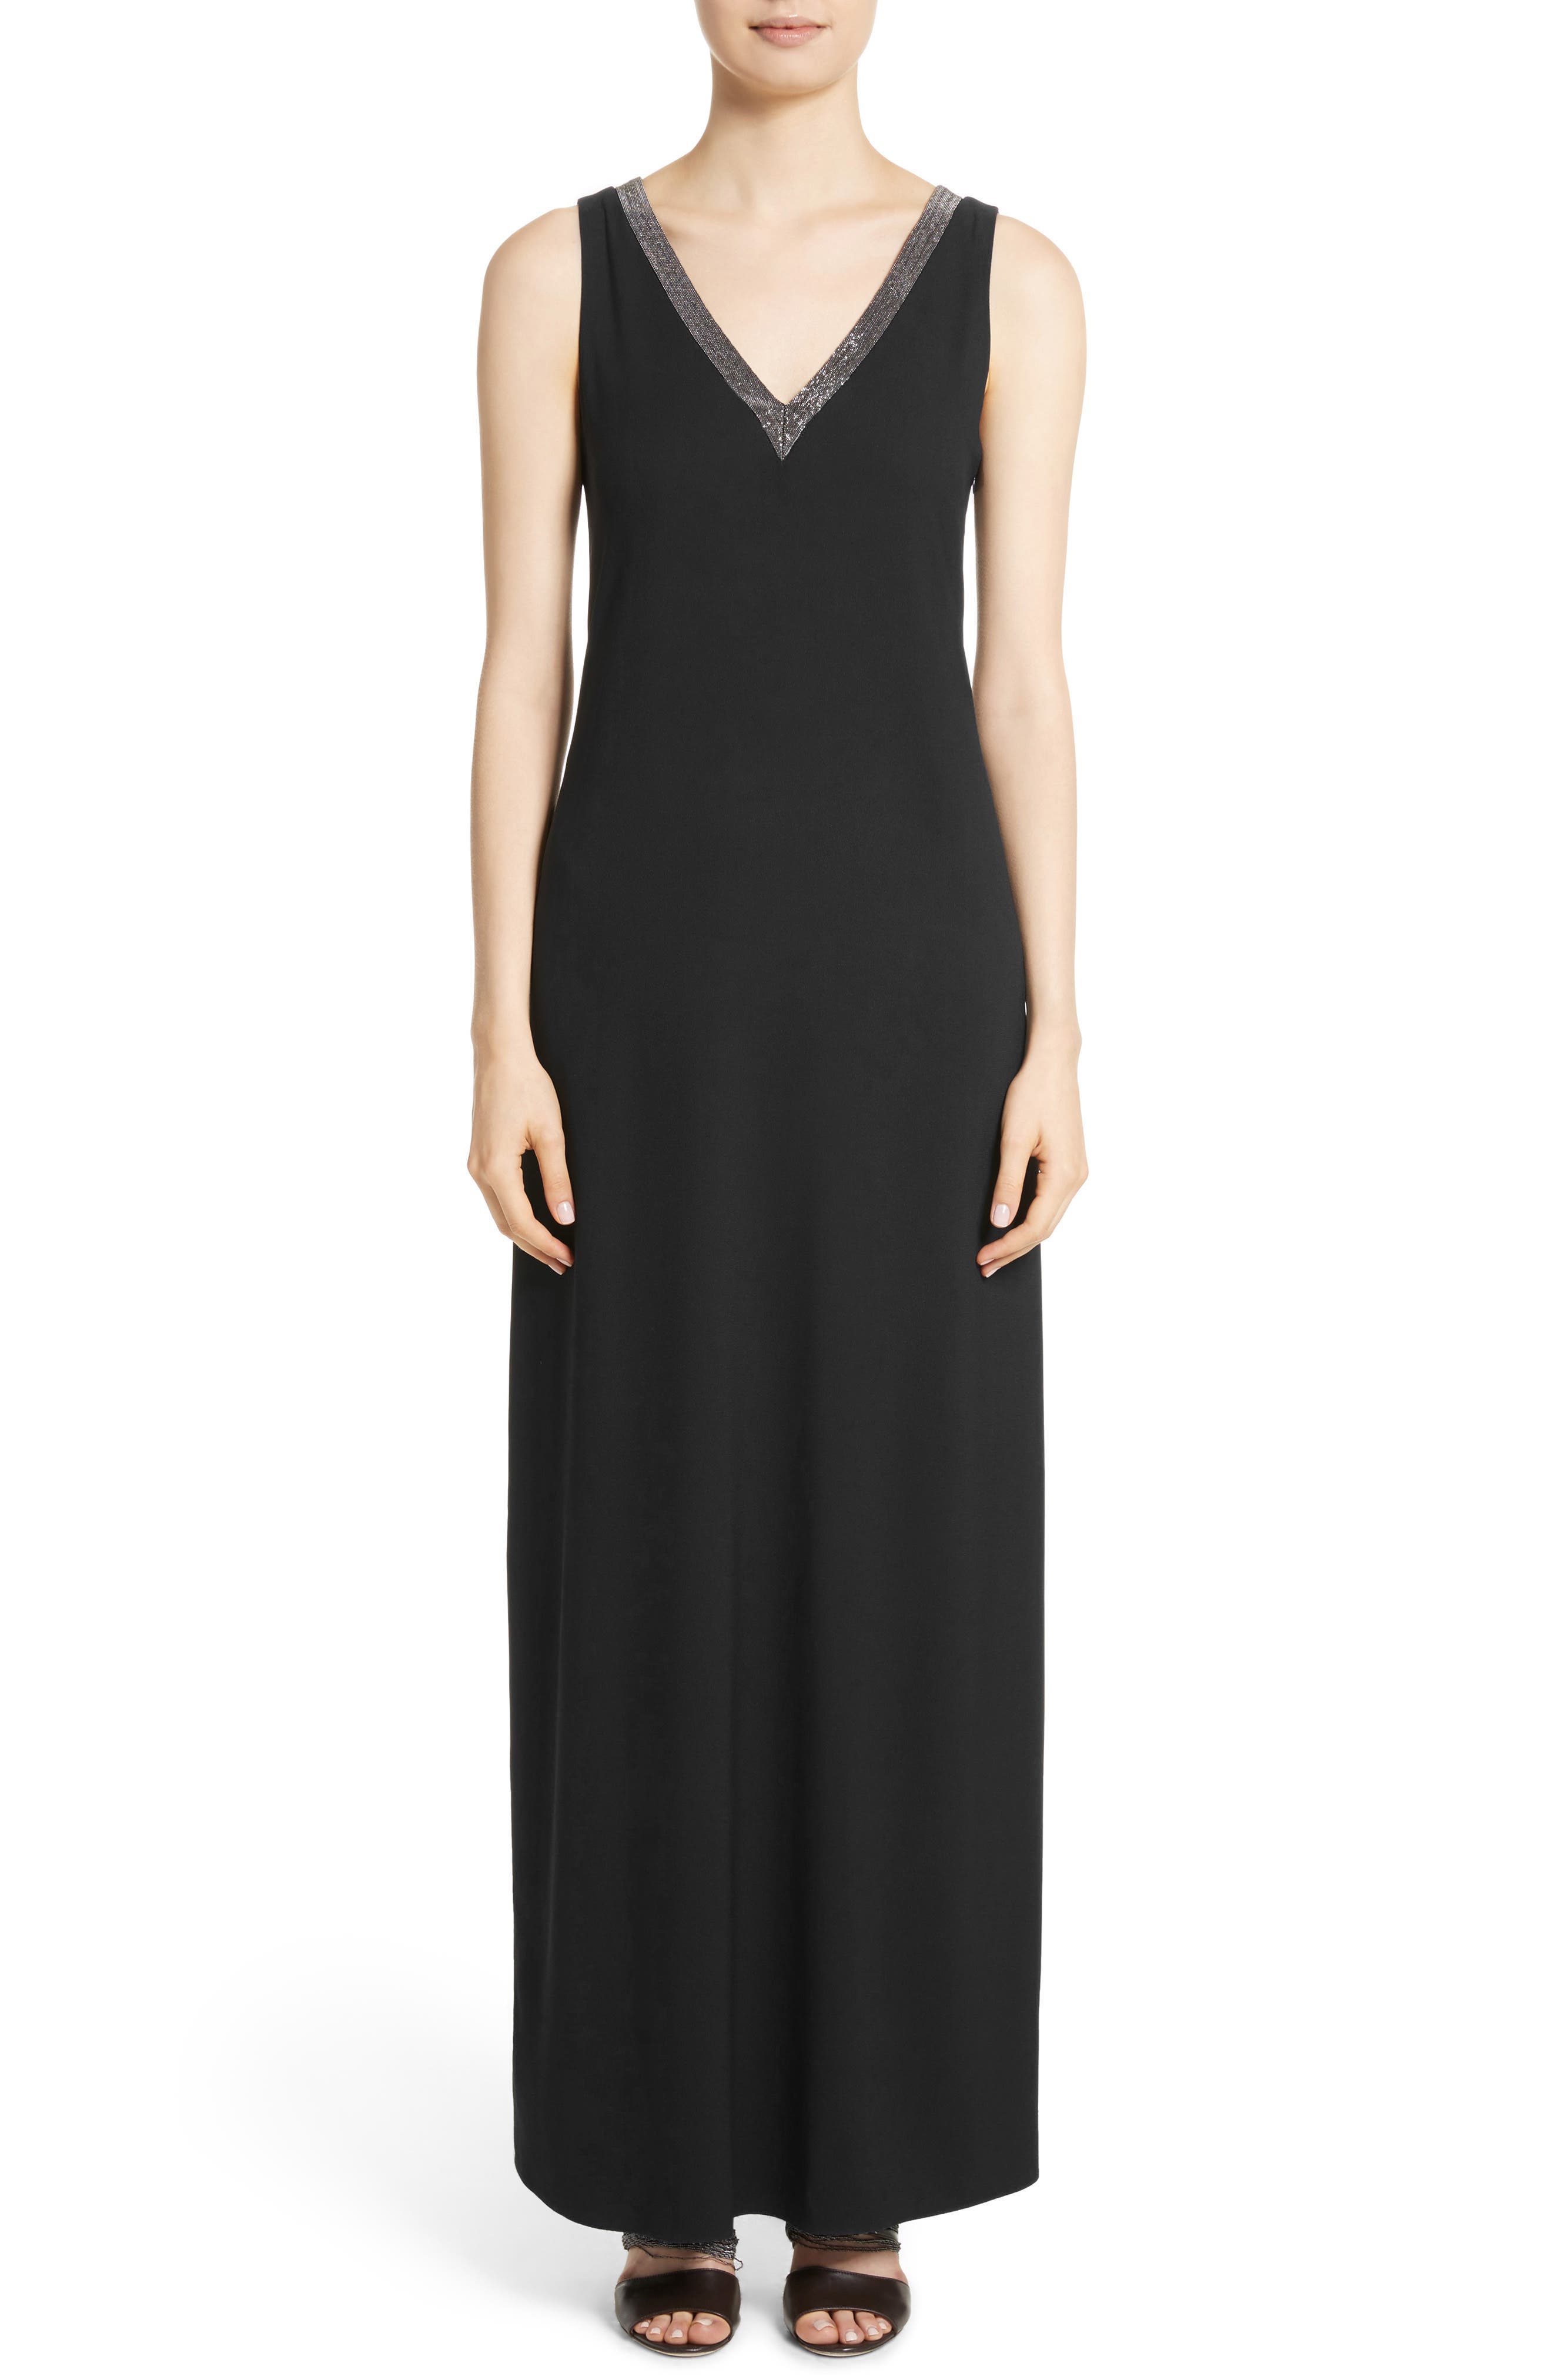 Alternate Image 1 Selected - Fabiana Filippi Beaded Maxi Dress